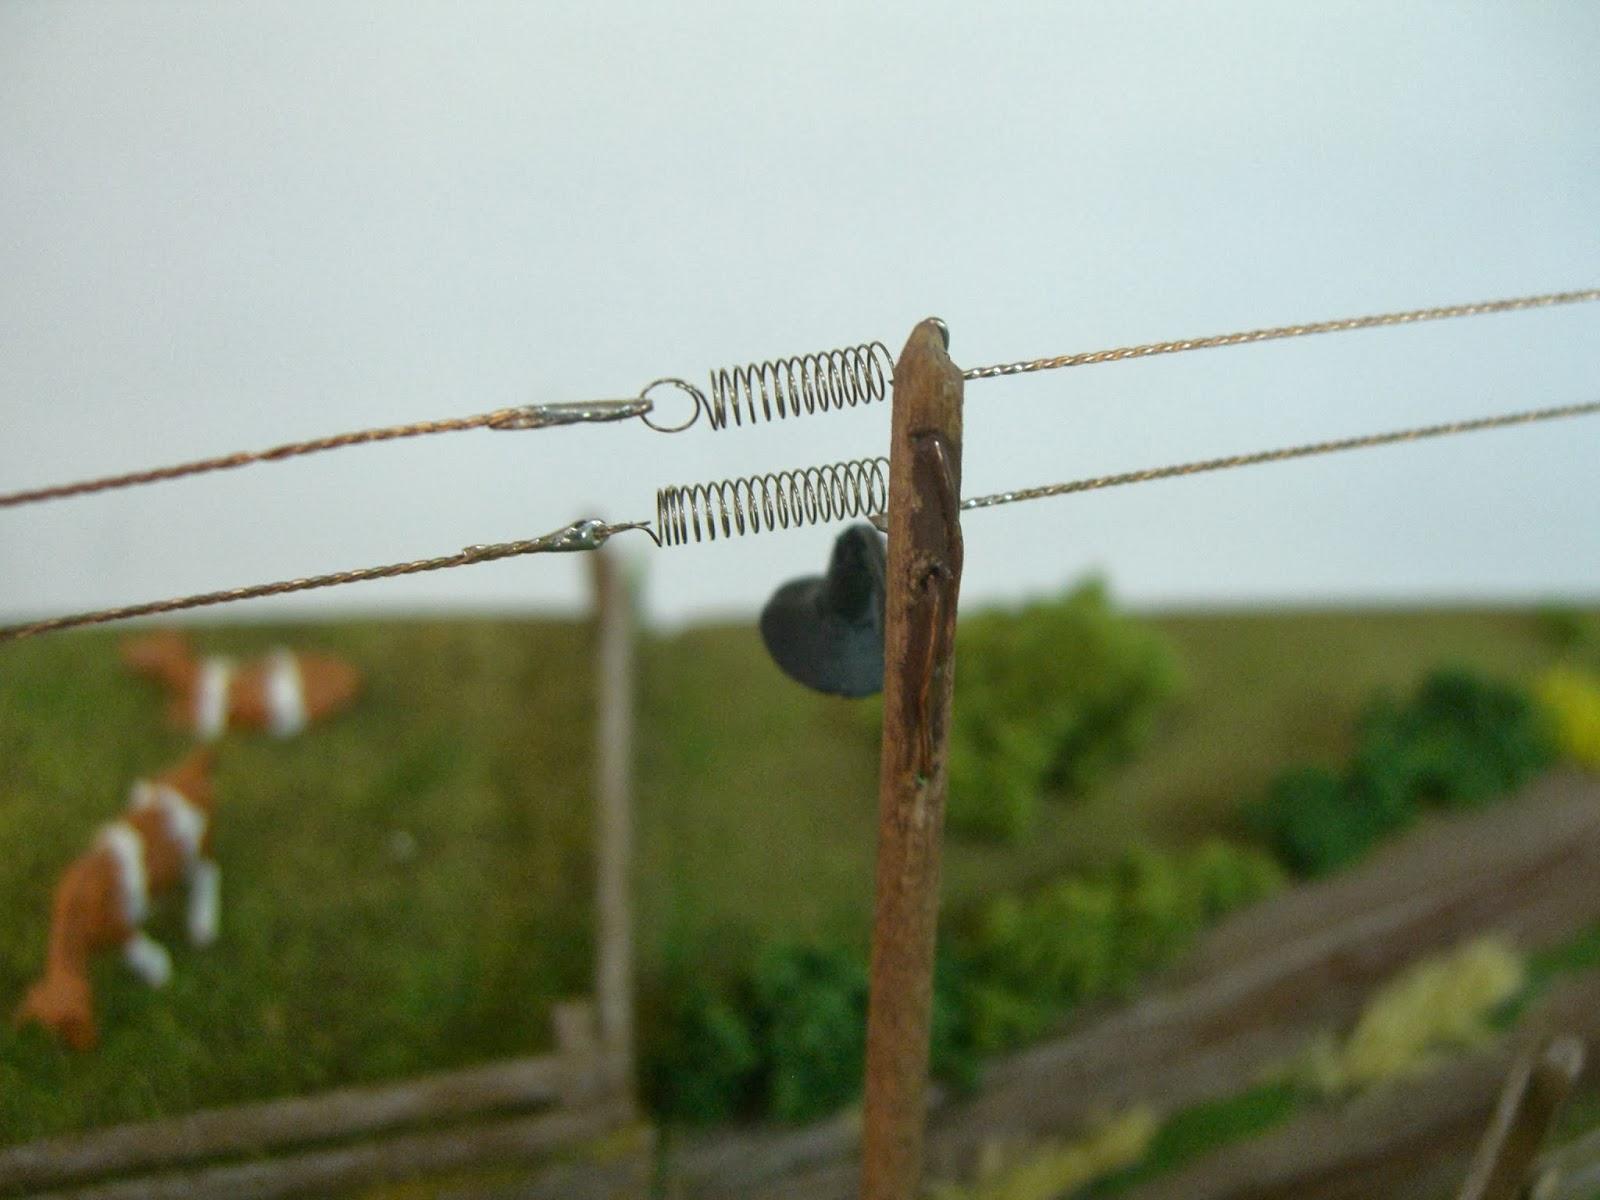 Paso a paso con h0 montaje de farolas sobre postes madera - Farolas de pared ...